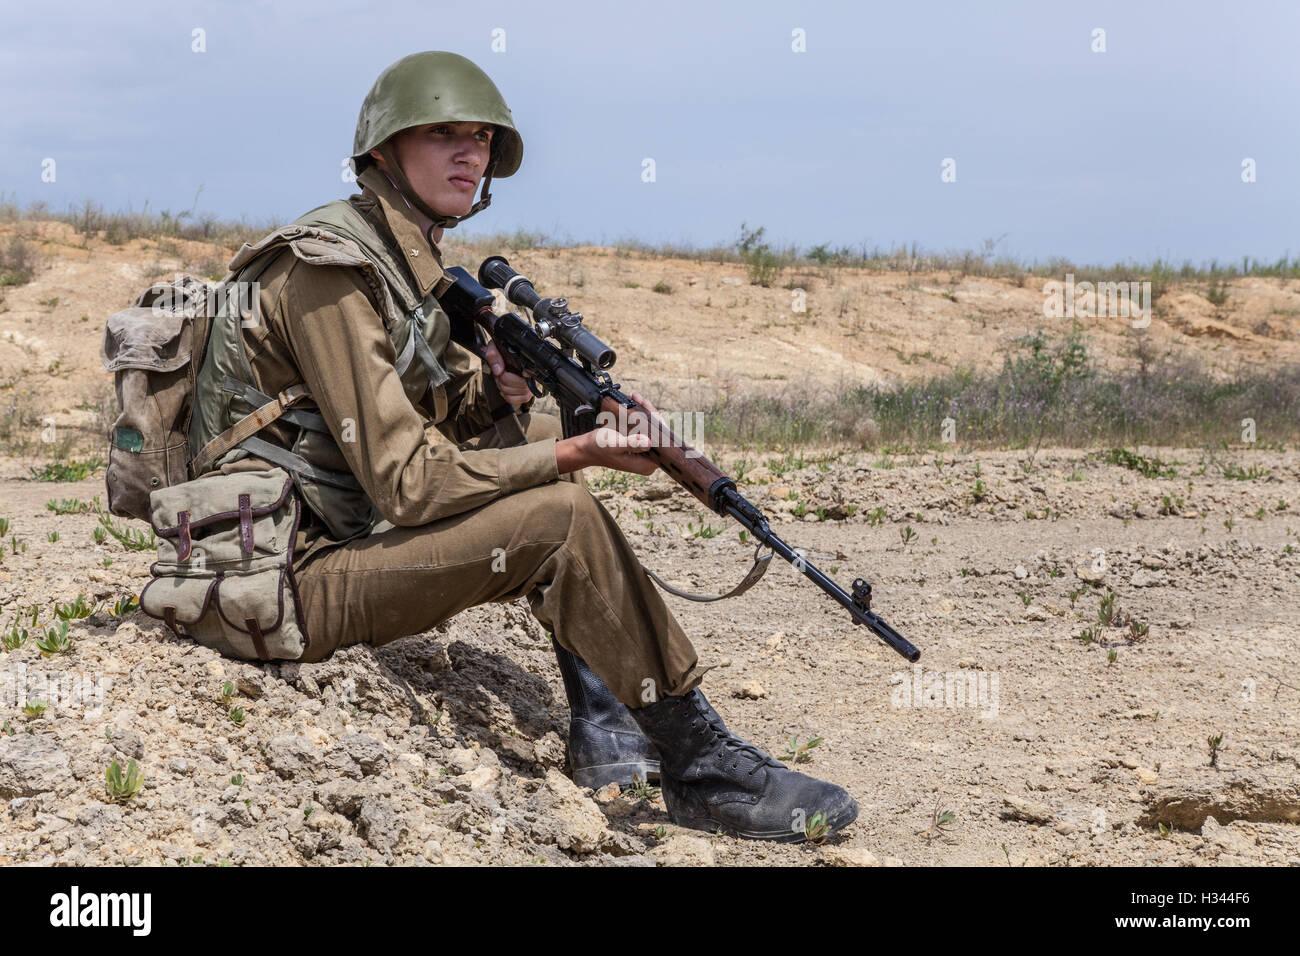 Soviet Afghanistan war - Page 6 Soviet-paratrooper-in-afghanistan-H344F6